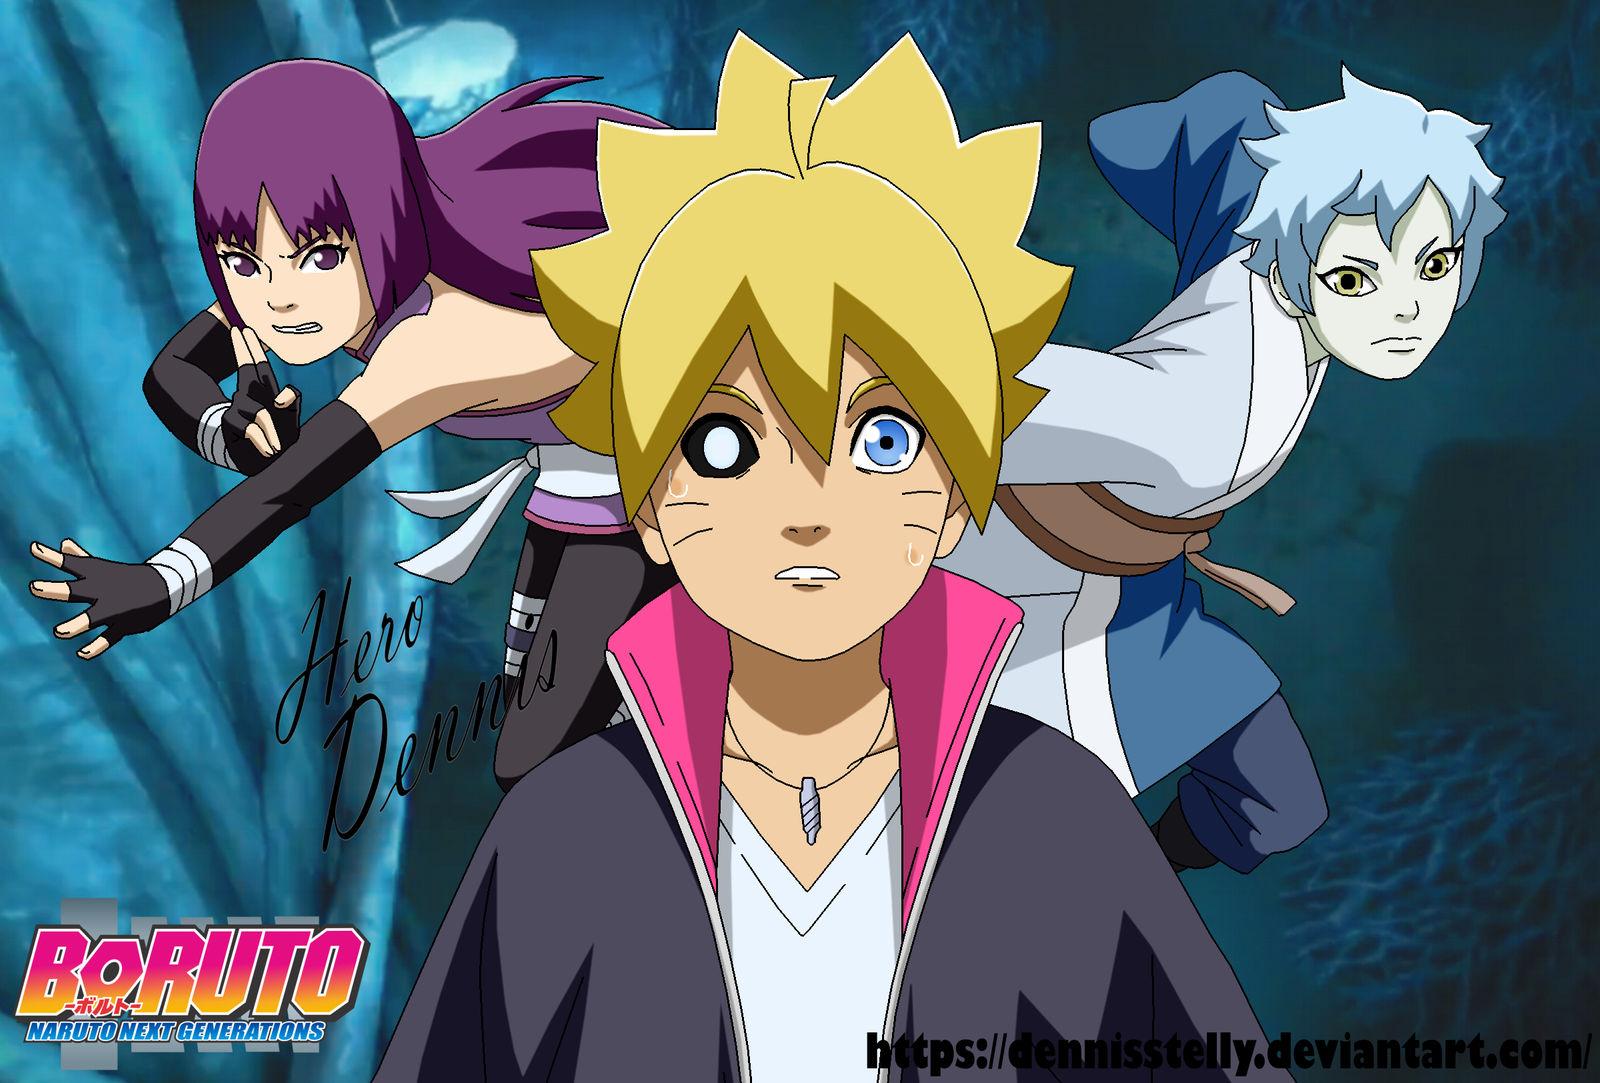 Boruto - Naruto Next Generation - Sumire Arc by DennisStelly